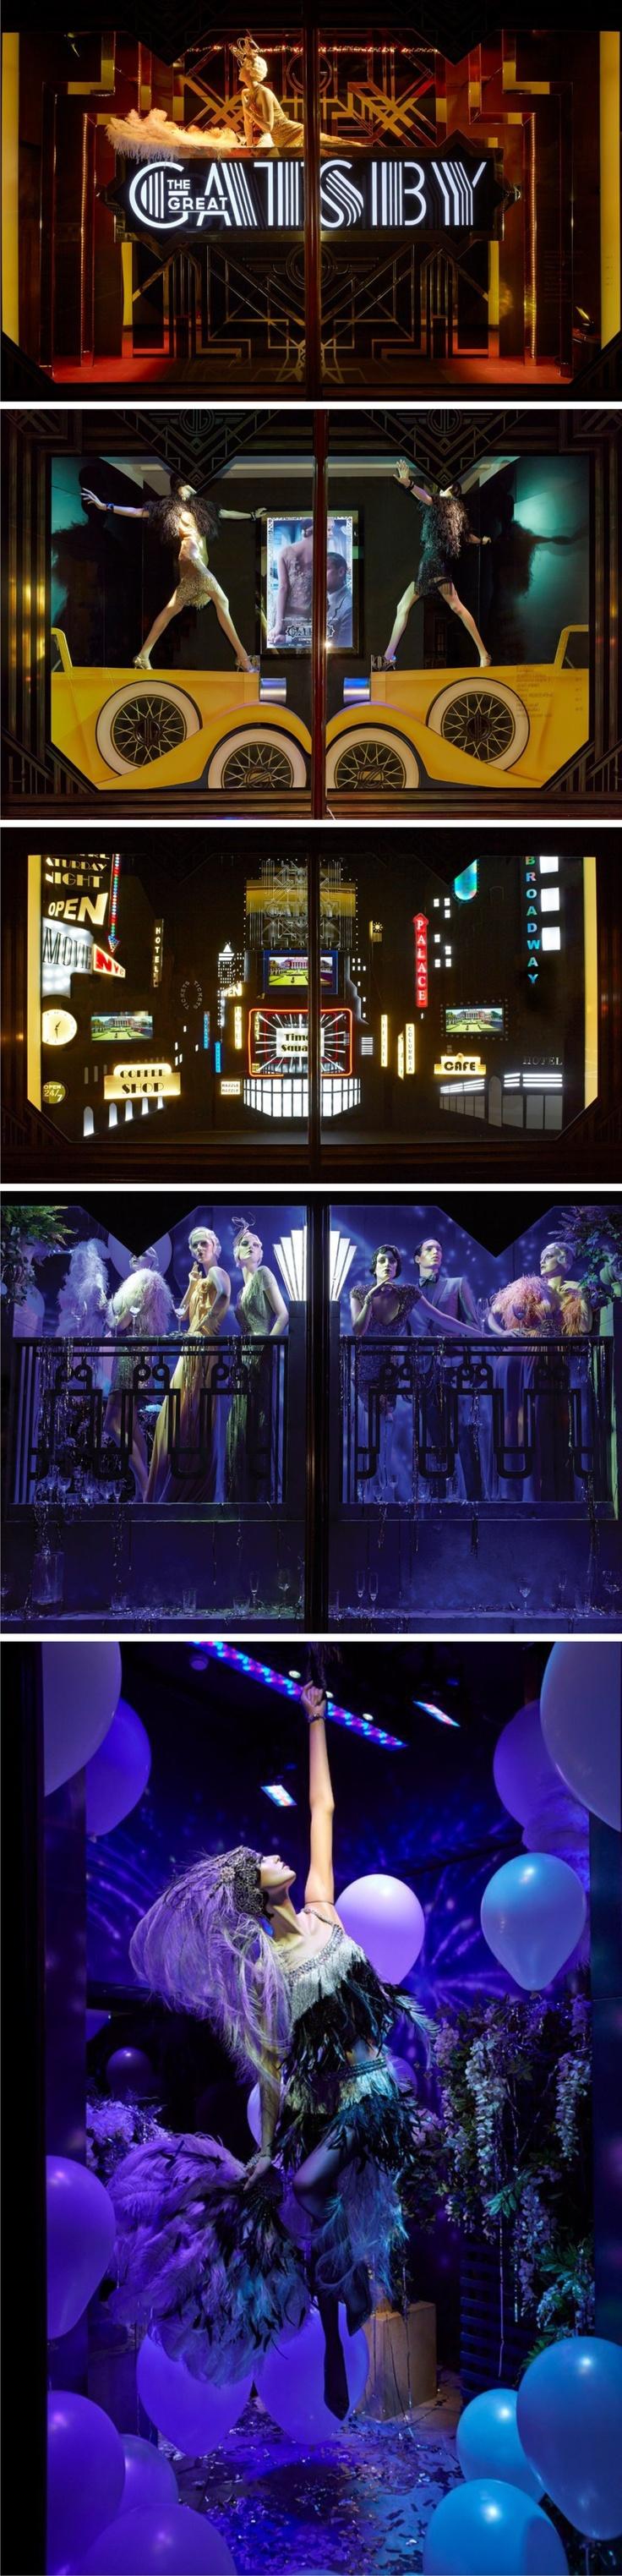 The Great Gatsby – Harrods Windows May 2013